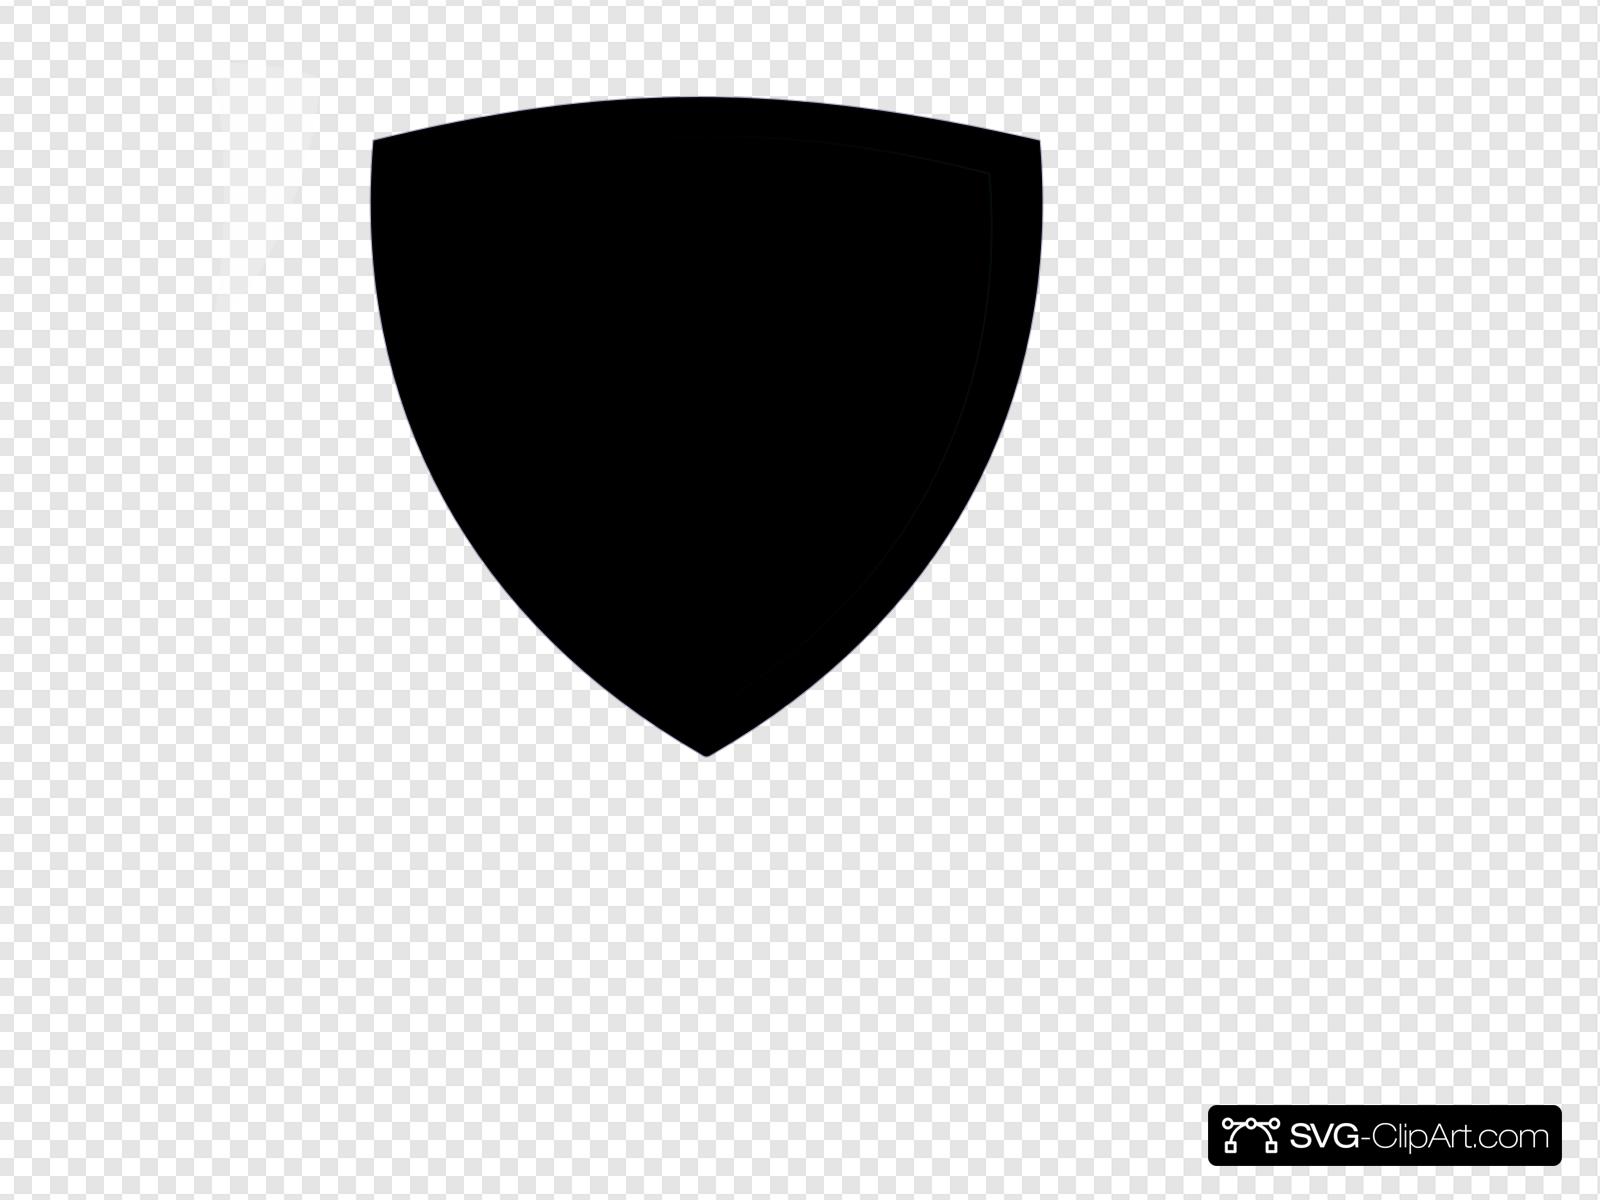 Simple Black Shield Clip art, Icon and SVG.